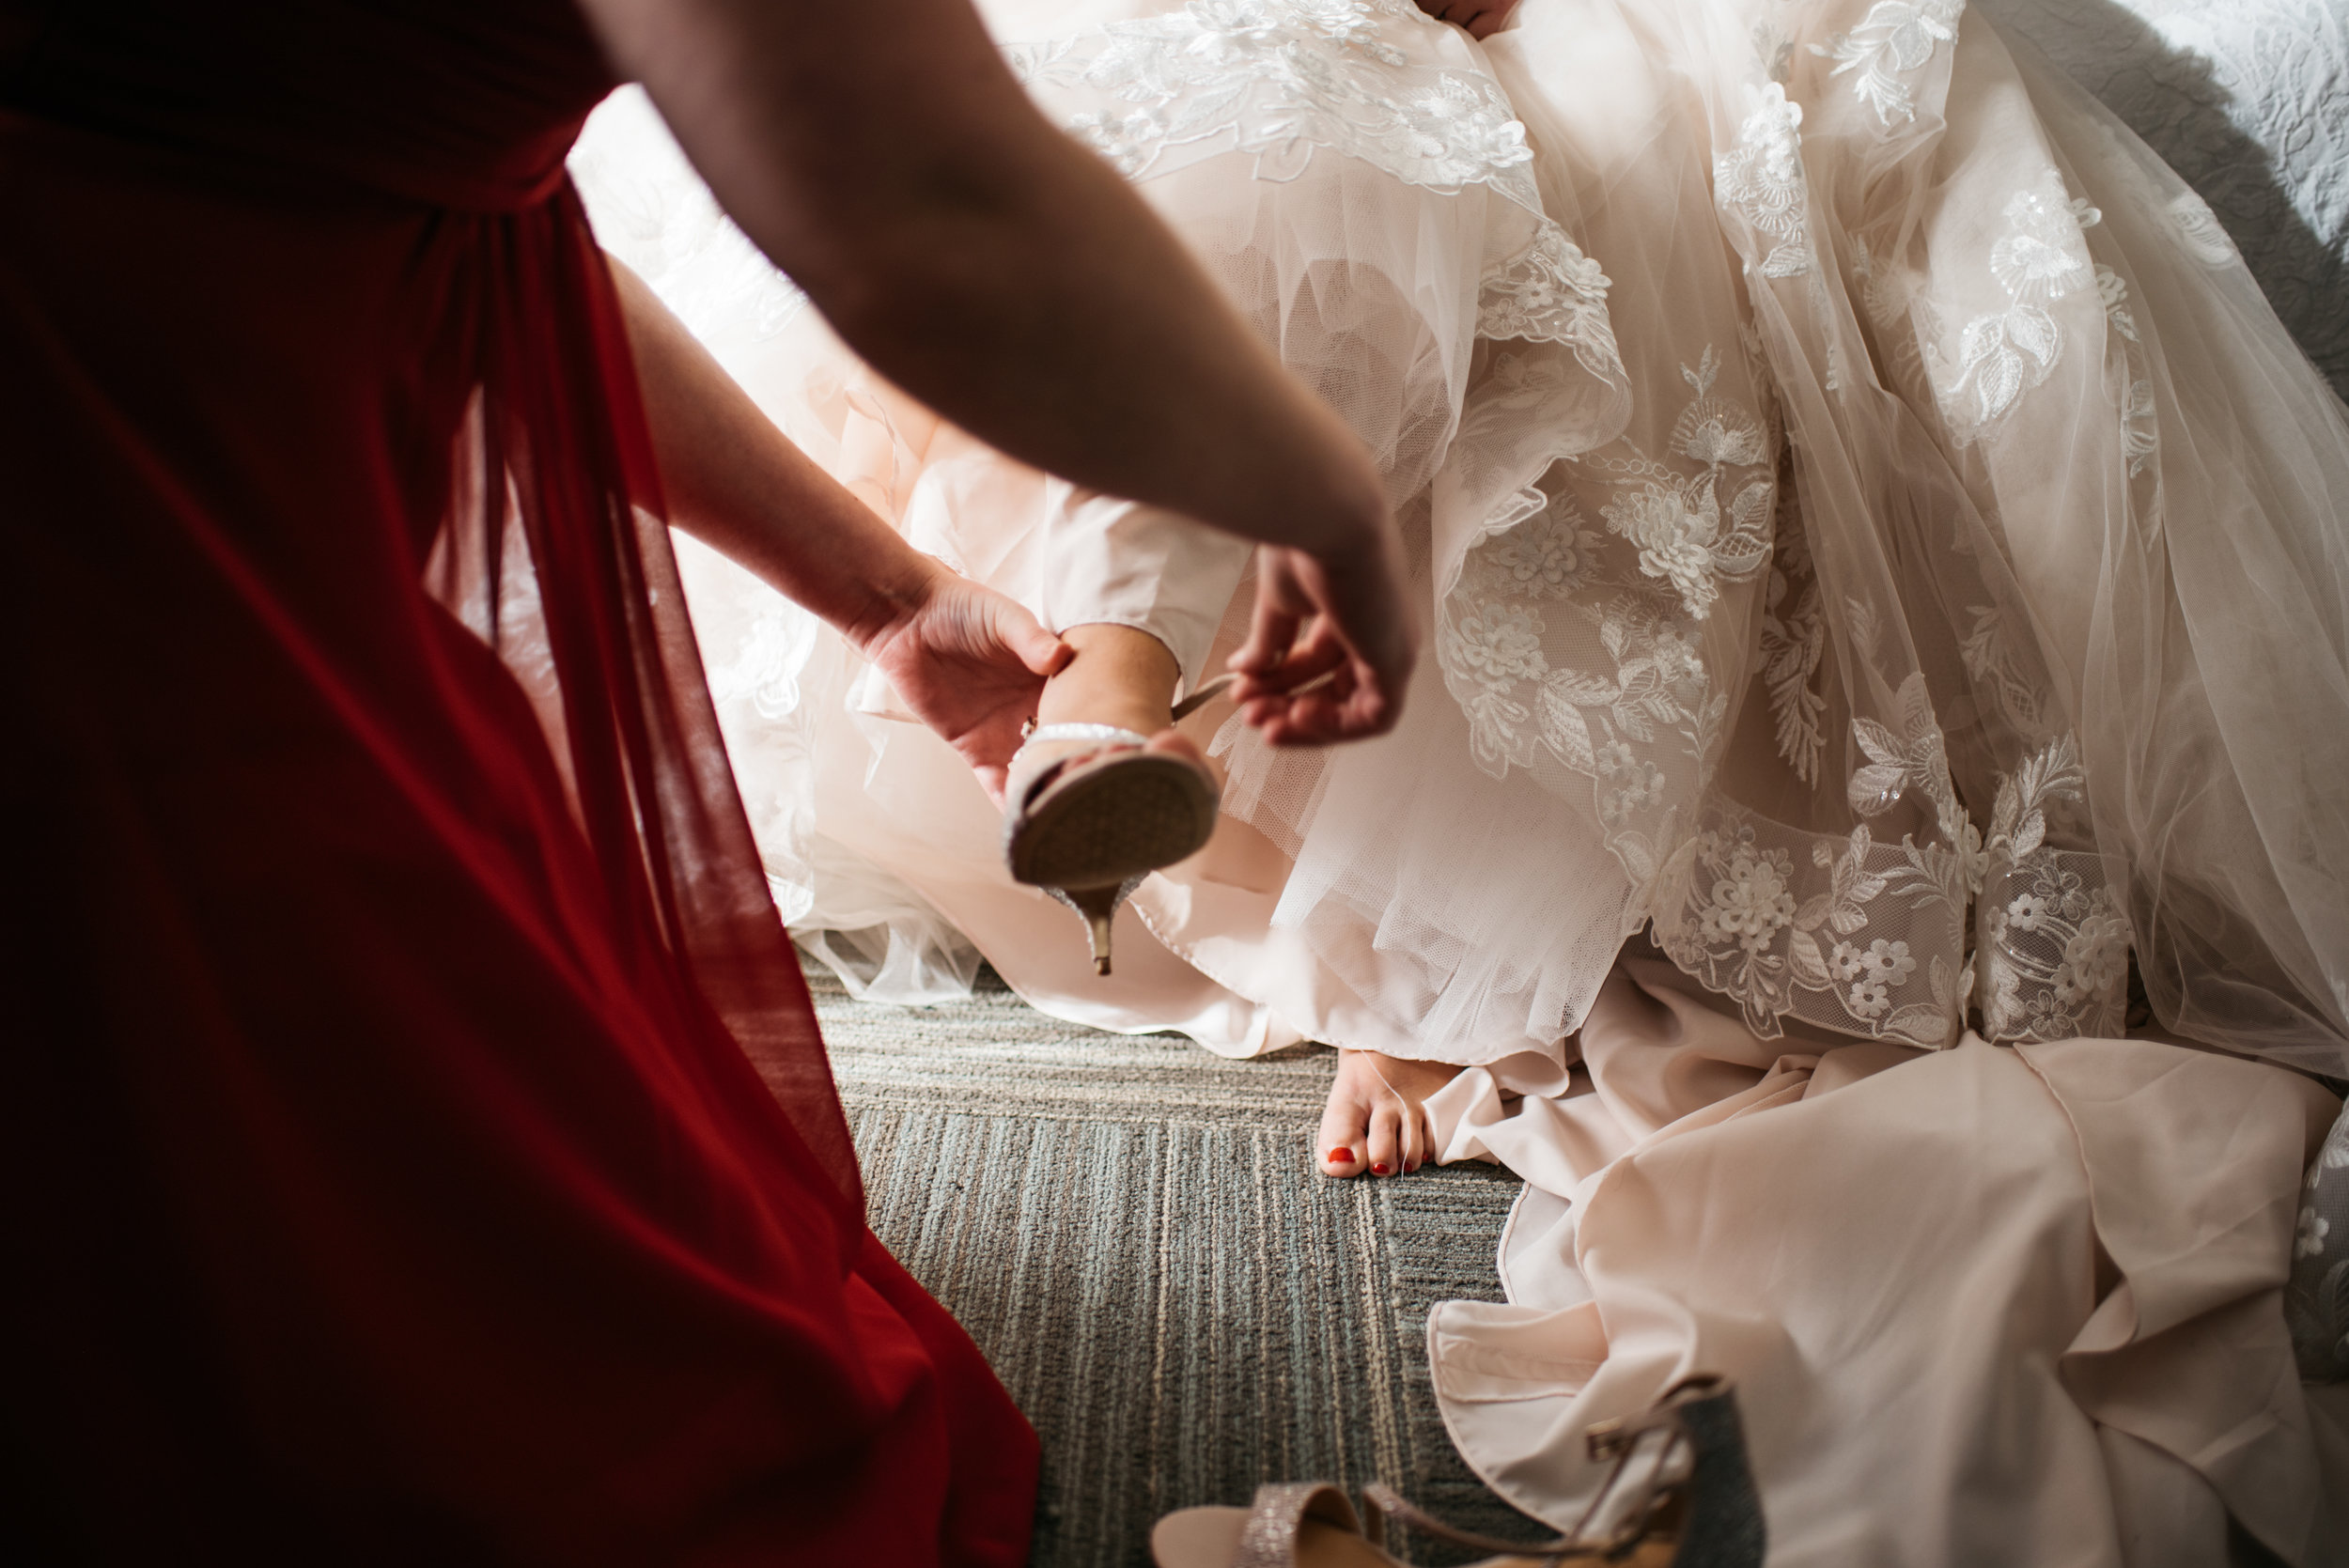 WeddingPhotos | NJPhotographer | Highlights-5-41.jpg